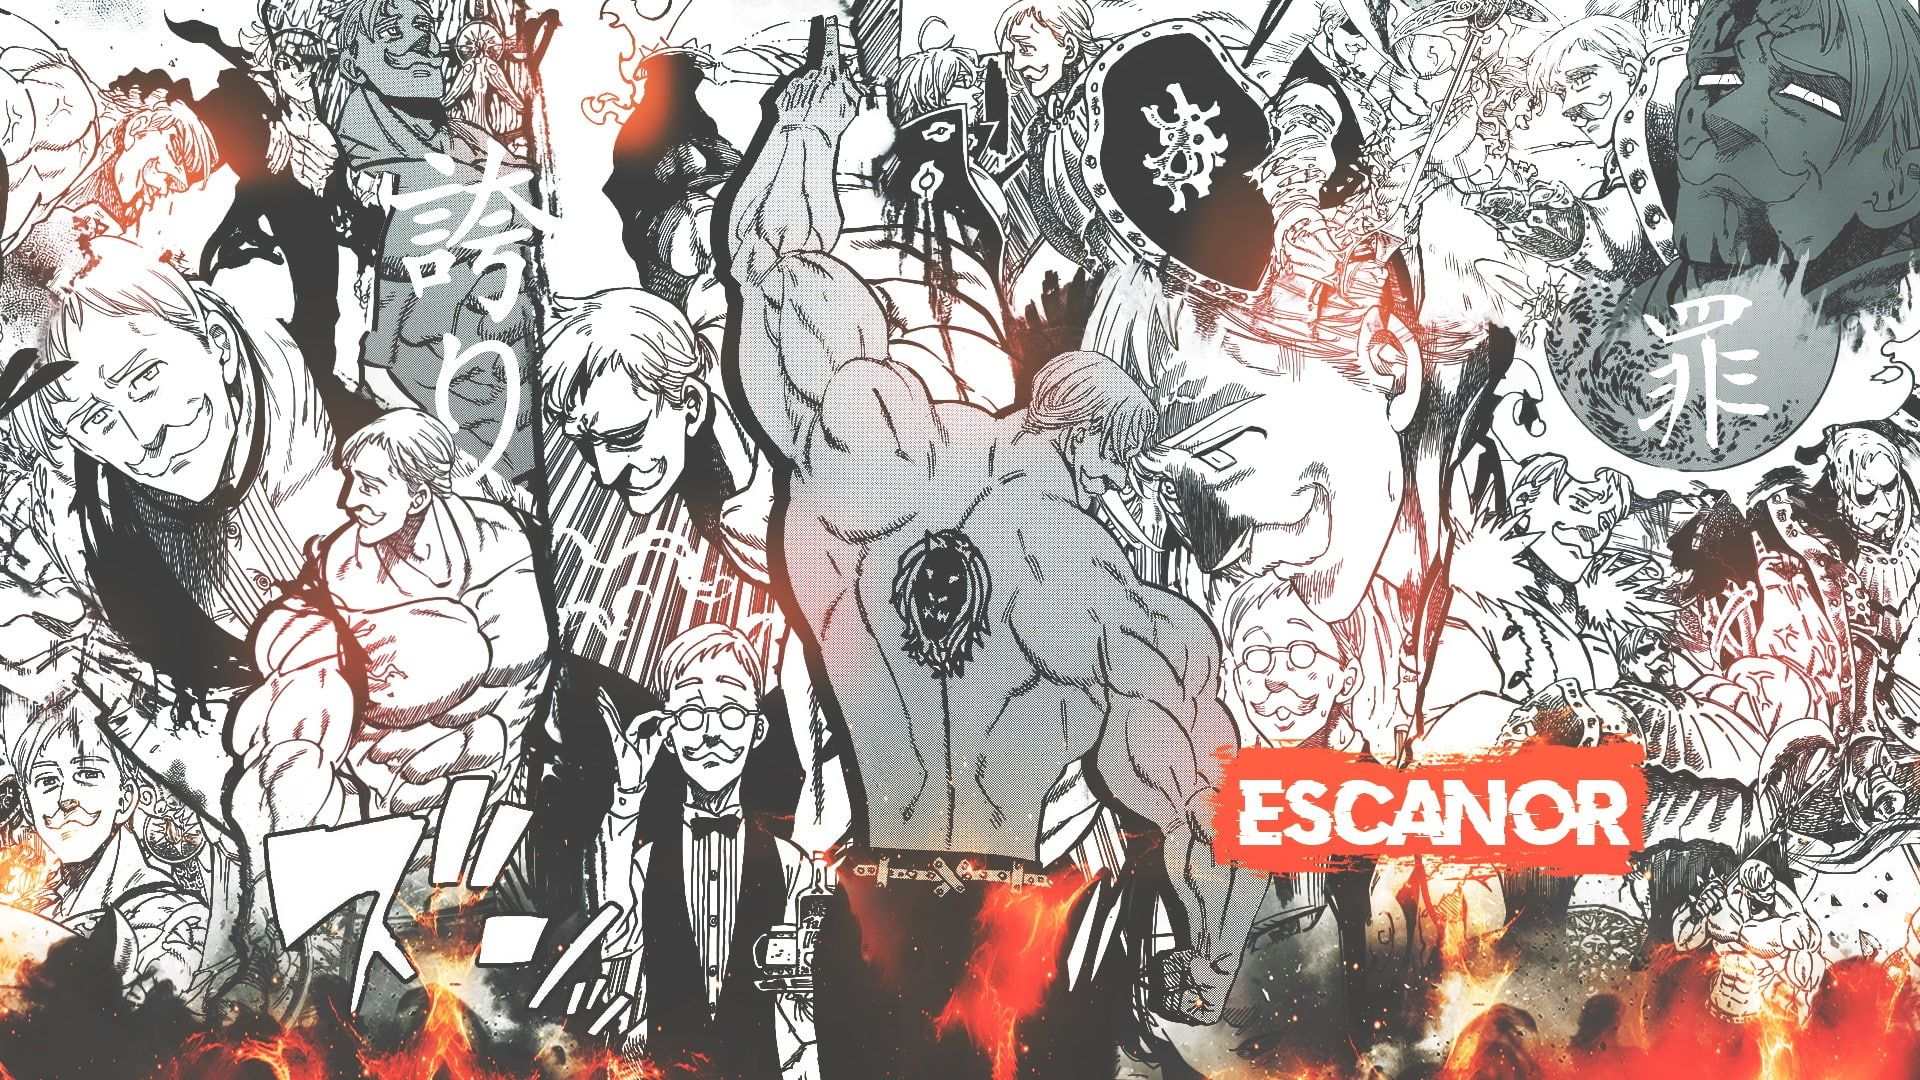 Anime The Seven Deadly Sins Escanor The Seven Deadly Sins 1080p Wallpaper Hdwallpaper Desktop In 2020 Seven Deadly Sins Anime Praise The Sun